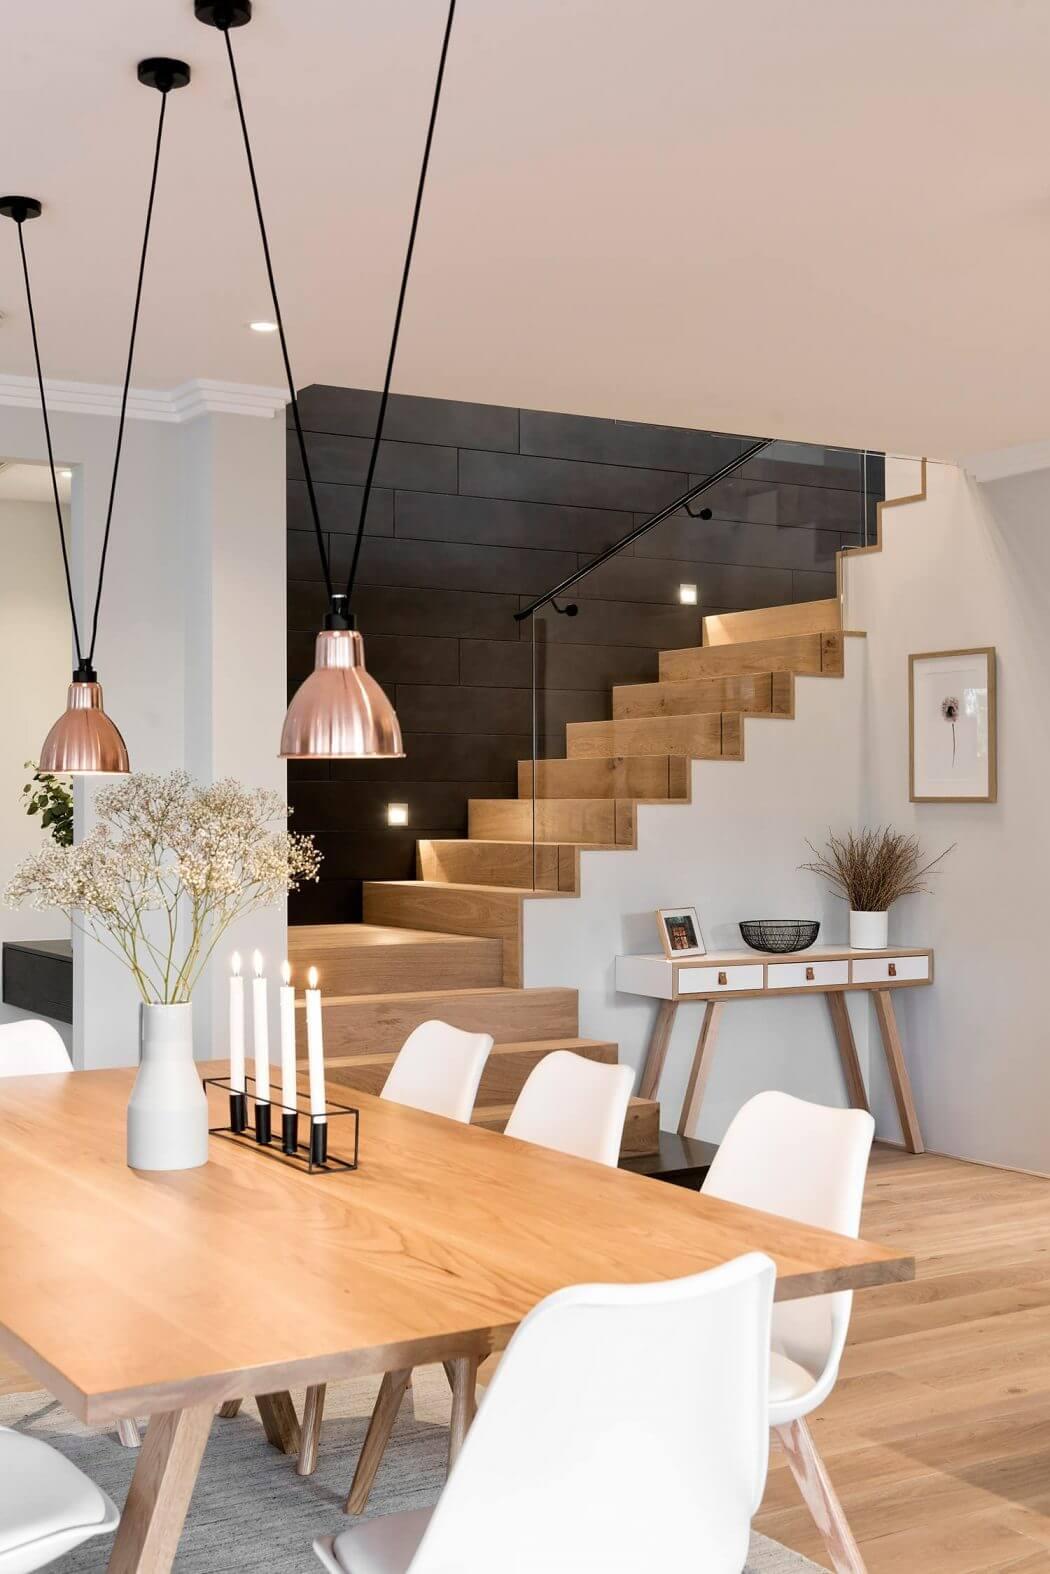 008-larsson-residence-webb-brownneaves-1050x1574